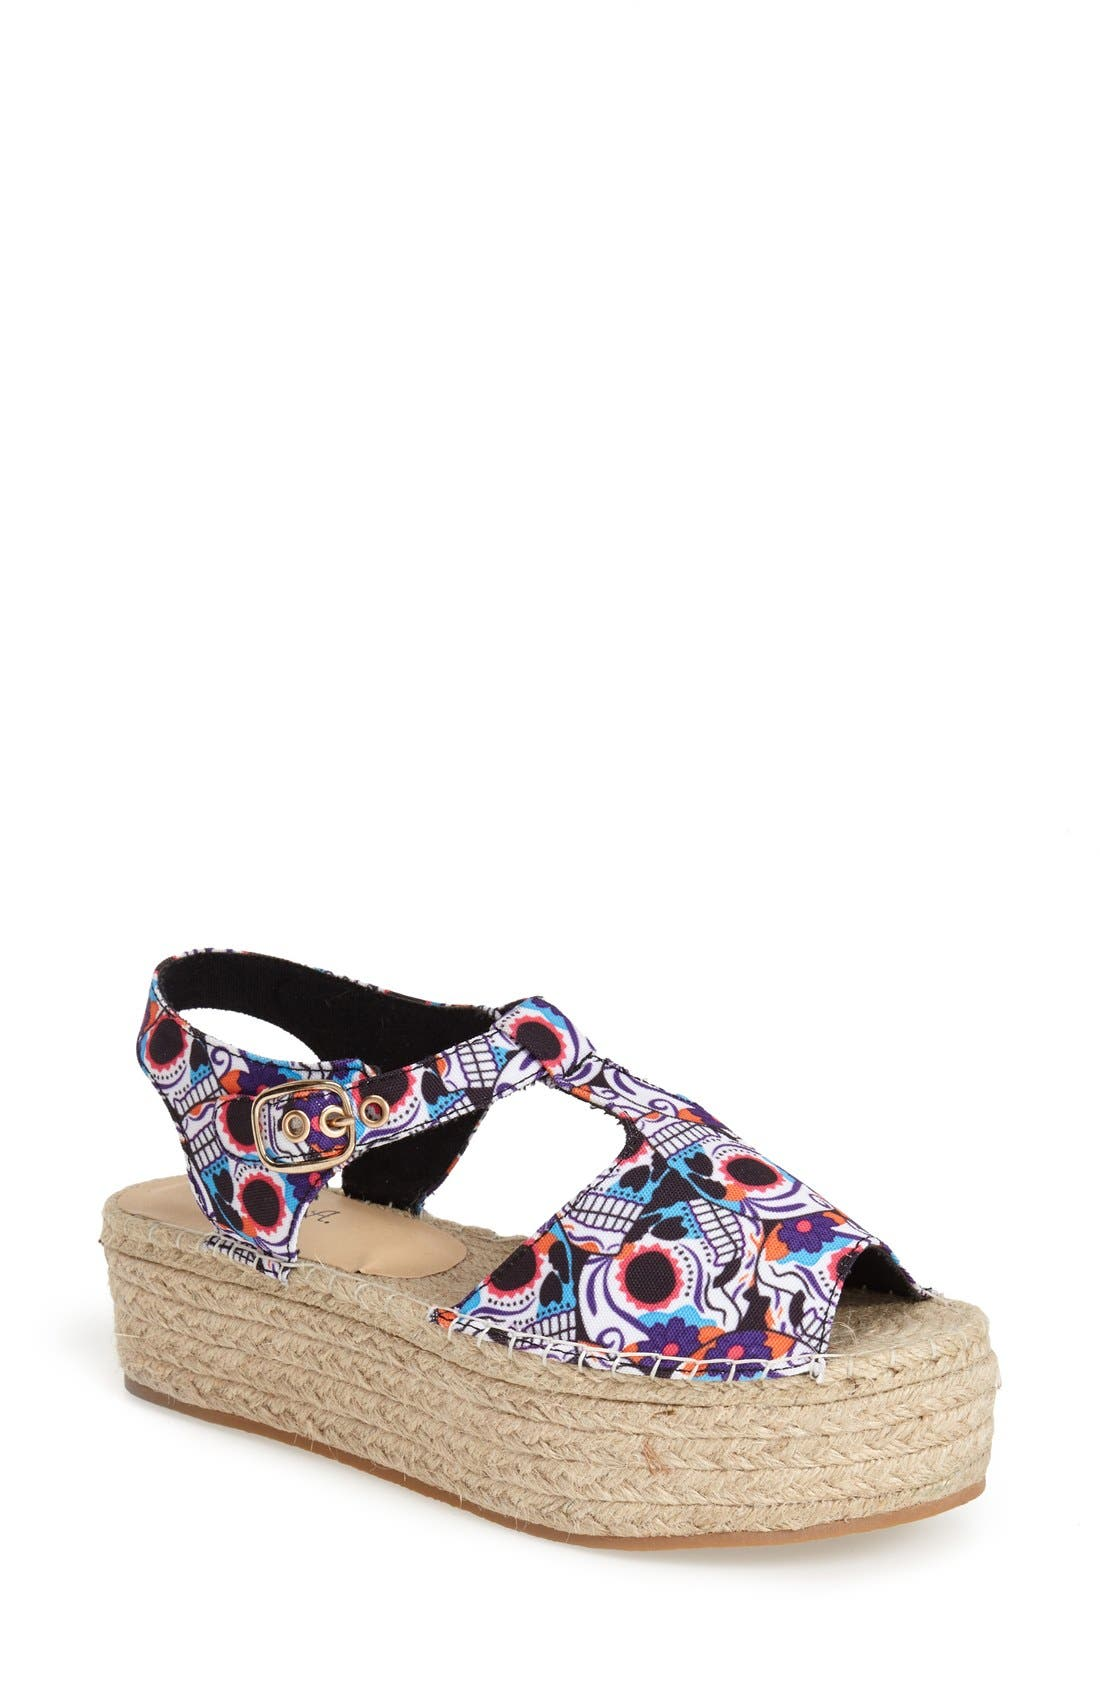 Main Image - N.Y.L.A. 'Alstacia' Espadrille Platform Sandal (Women)